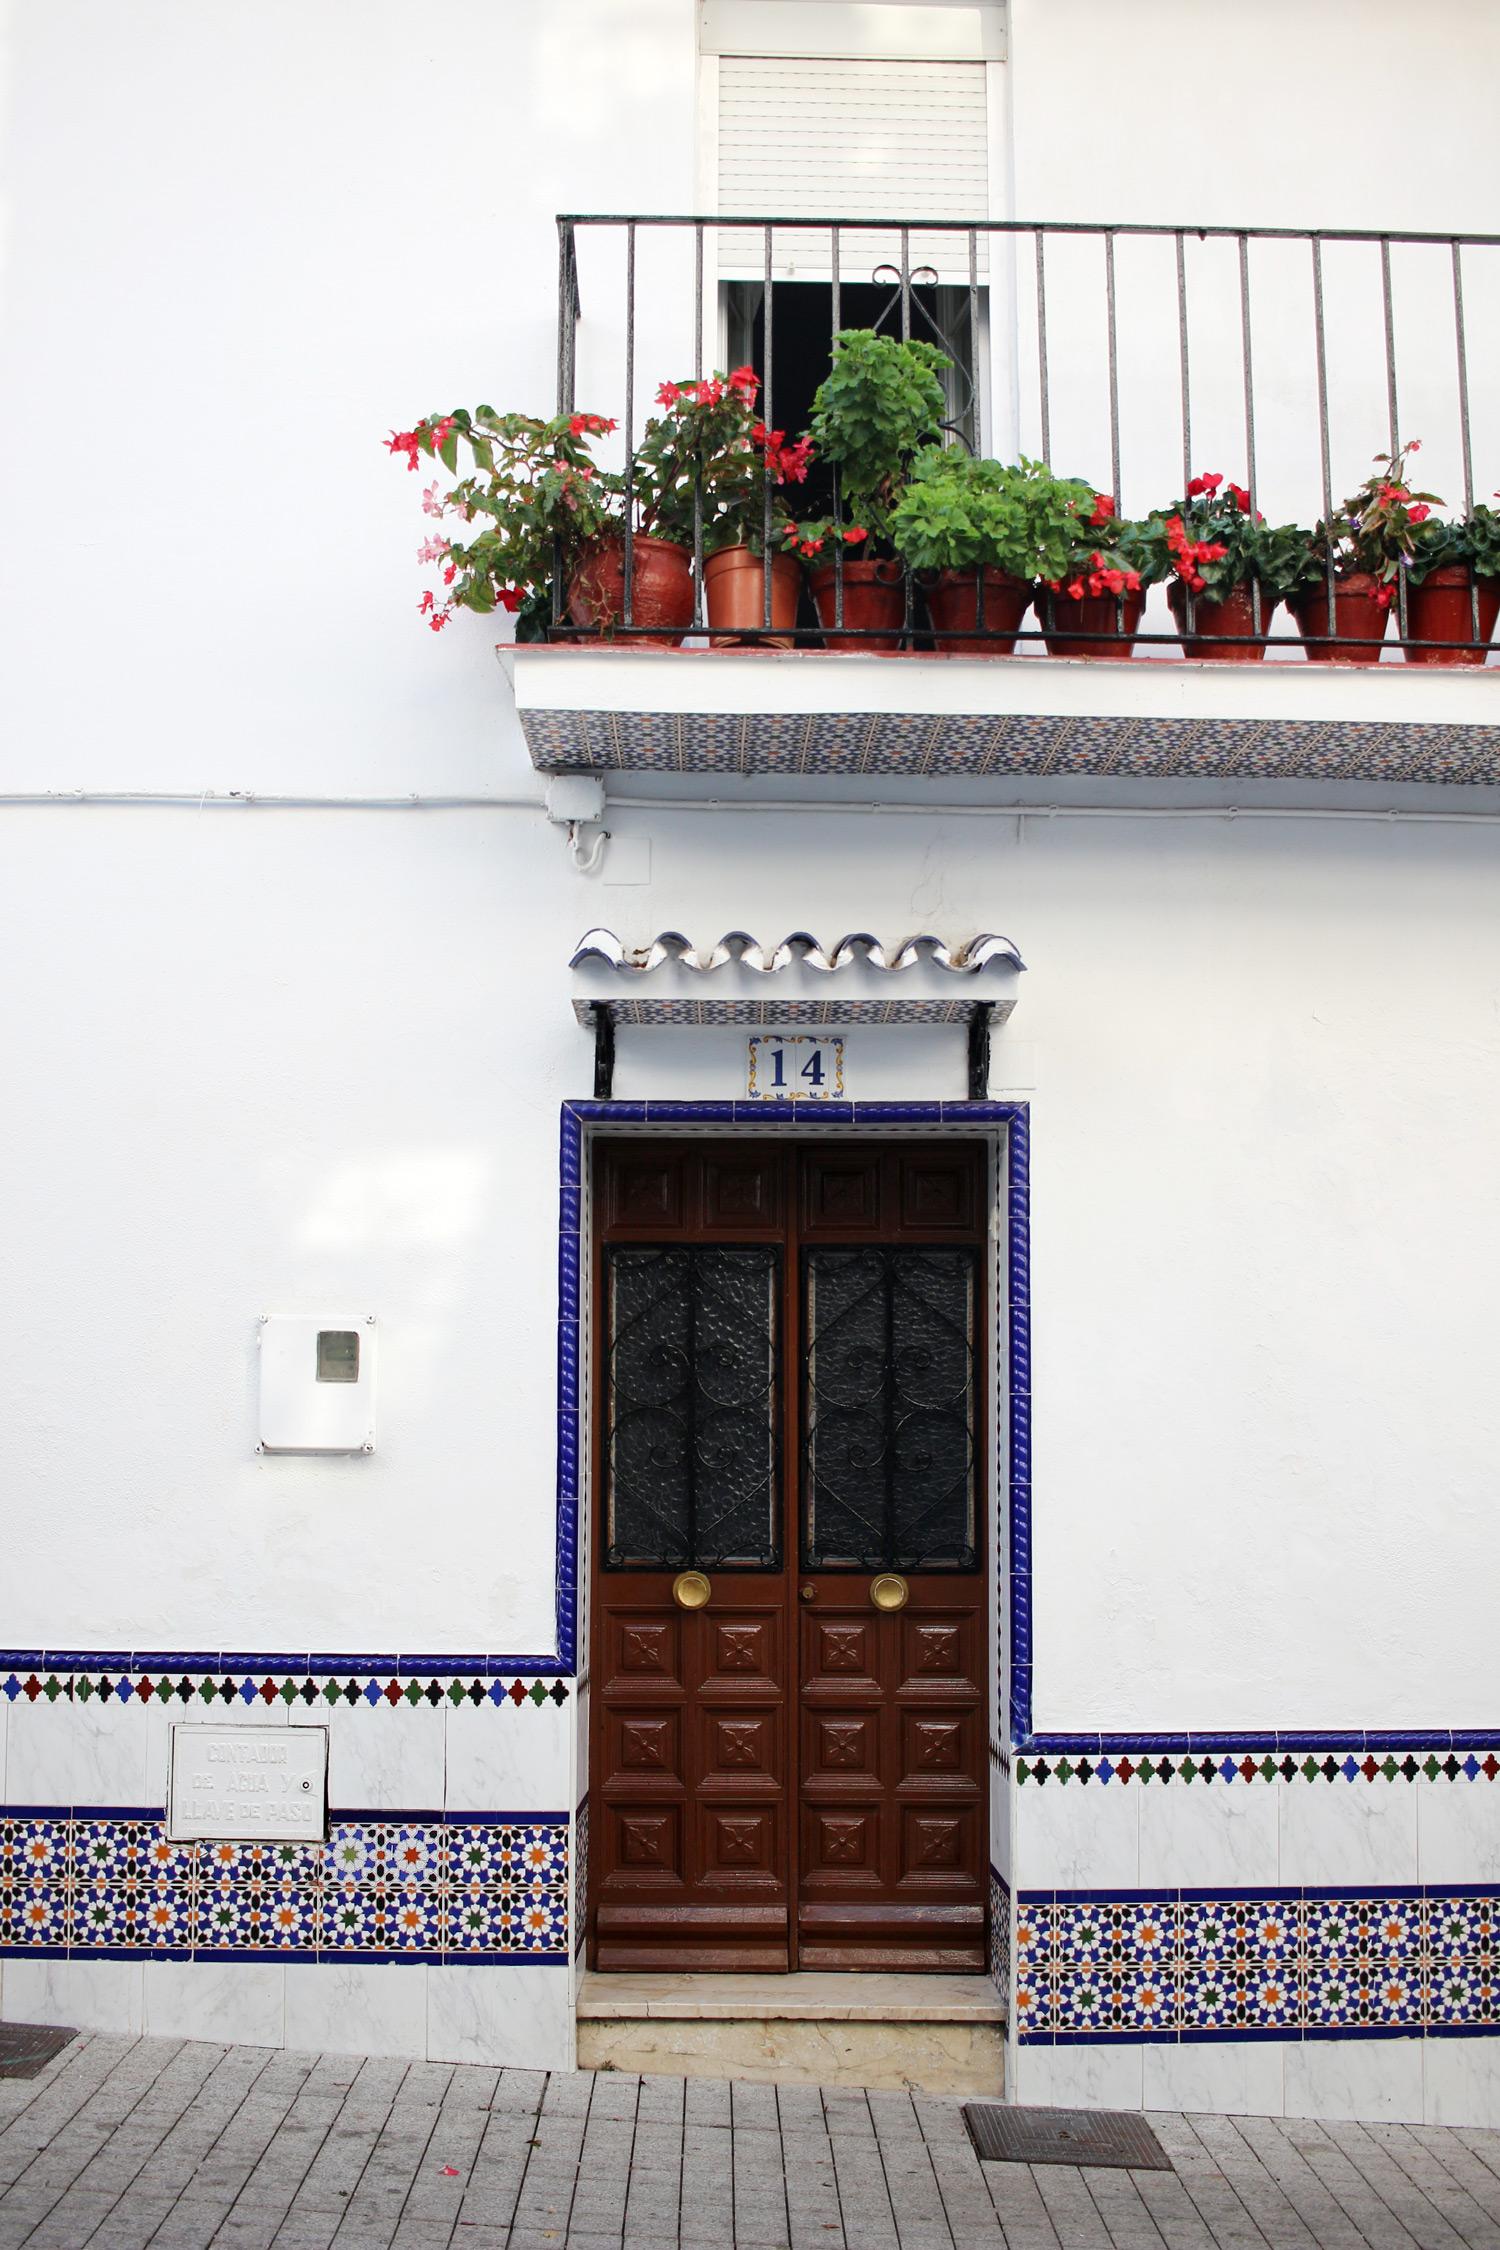 marbella-malaga-spain-travel-blogger-old-town-marbella-10